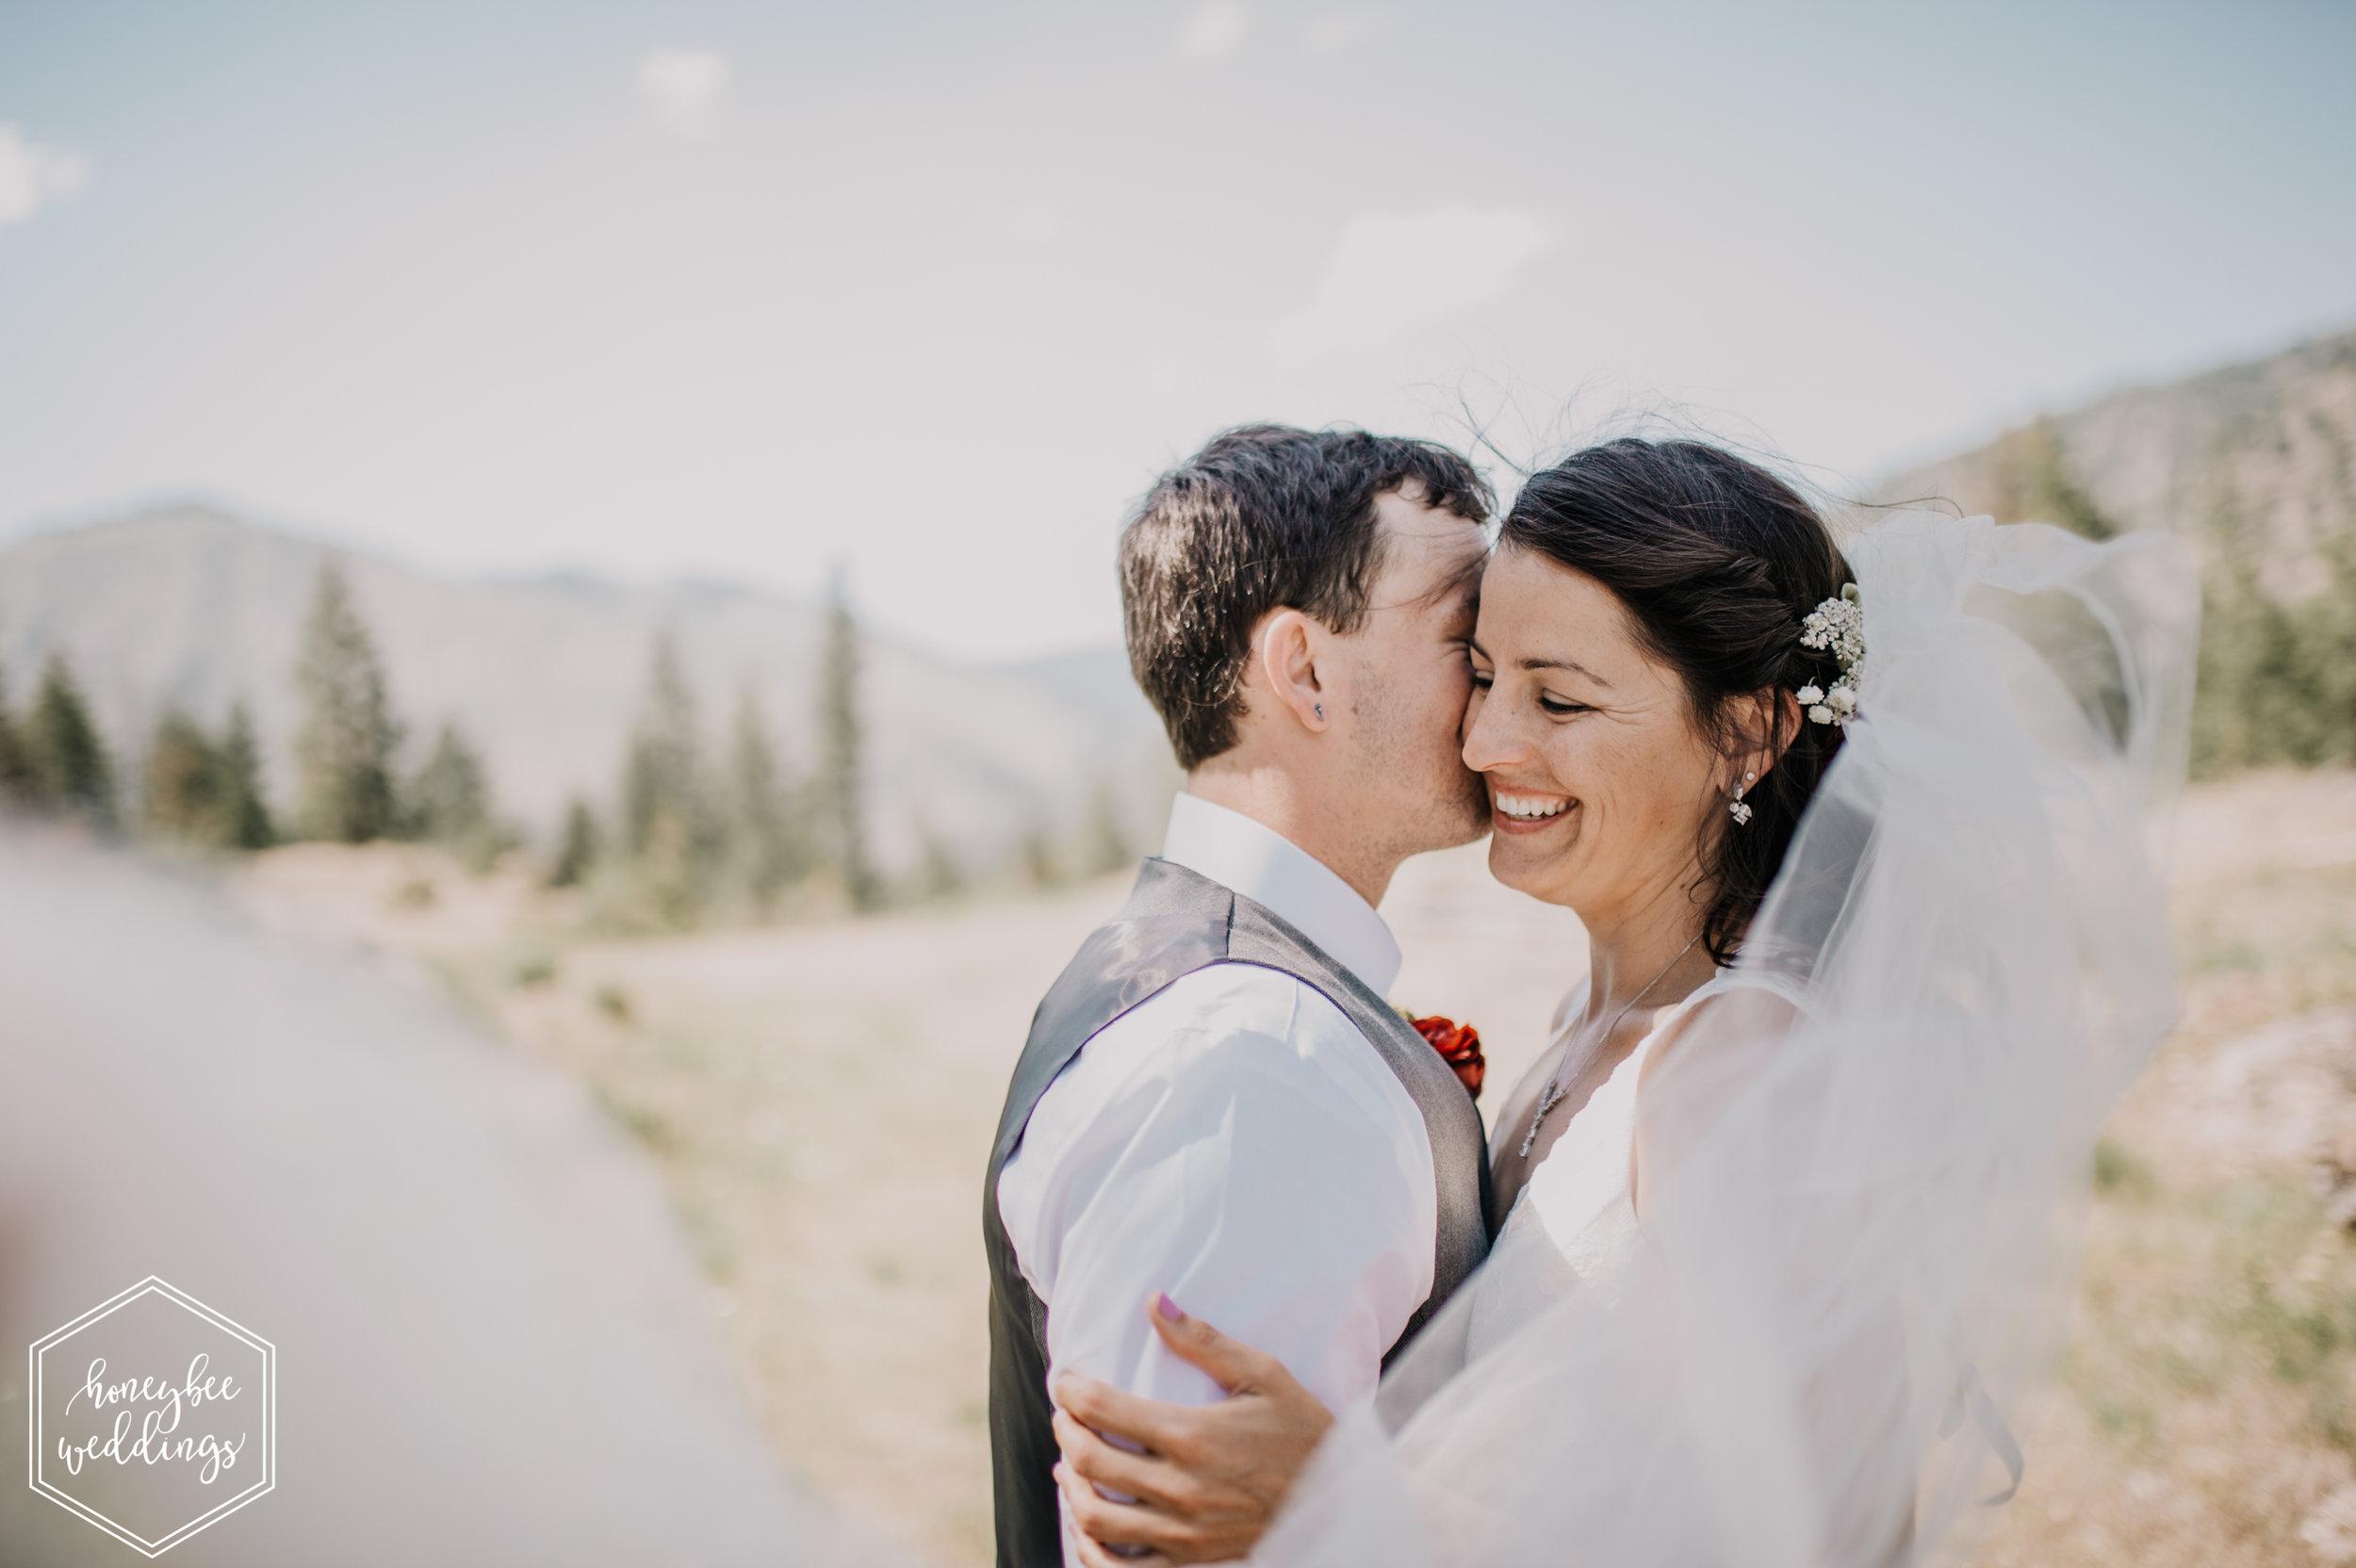 195 White Raven Wedding_Montana Wedding Photographer_Honeybee Weddings_ Meghan Maloney + Arza Hammond 2018-0131-2.jpg